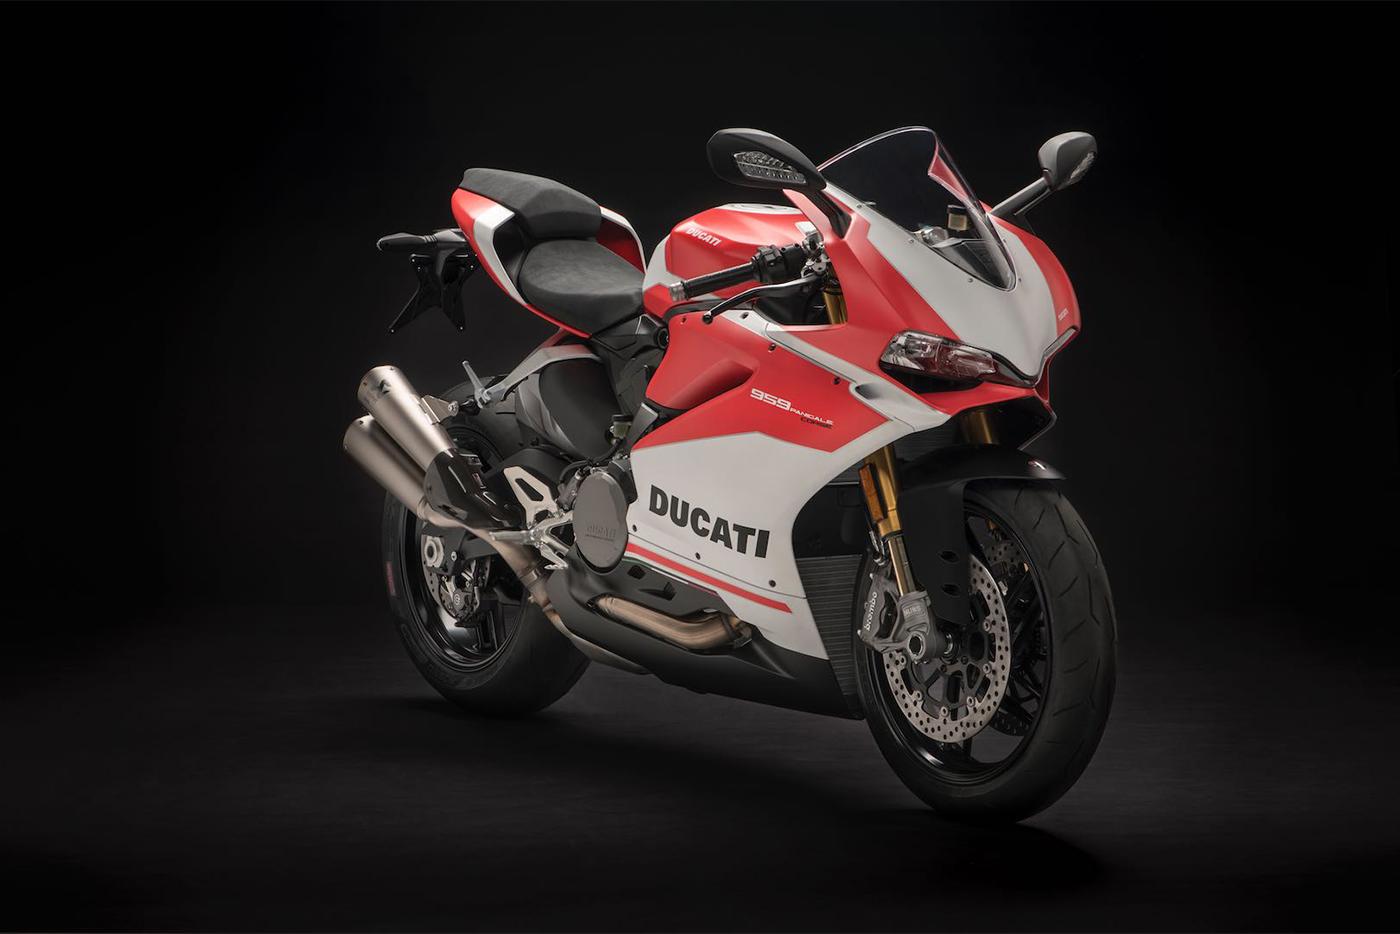 ducati-959-panigale-corse-1.jpg